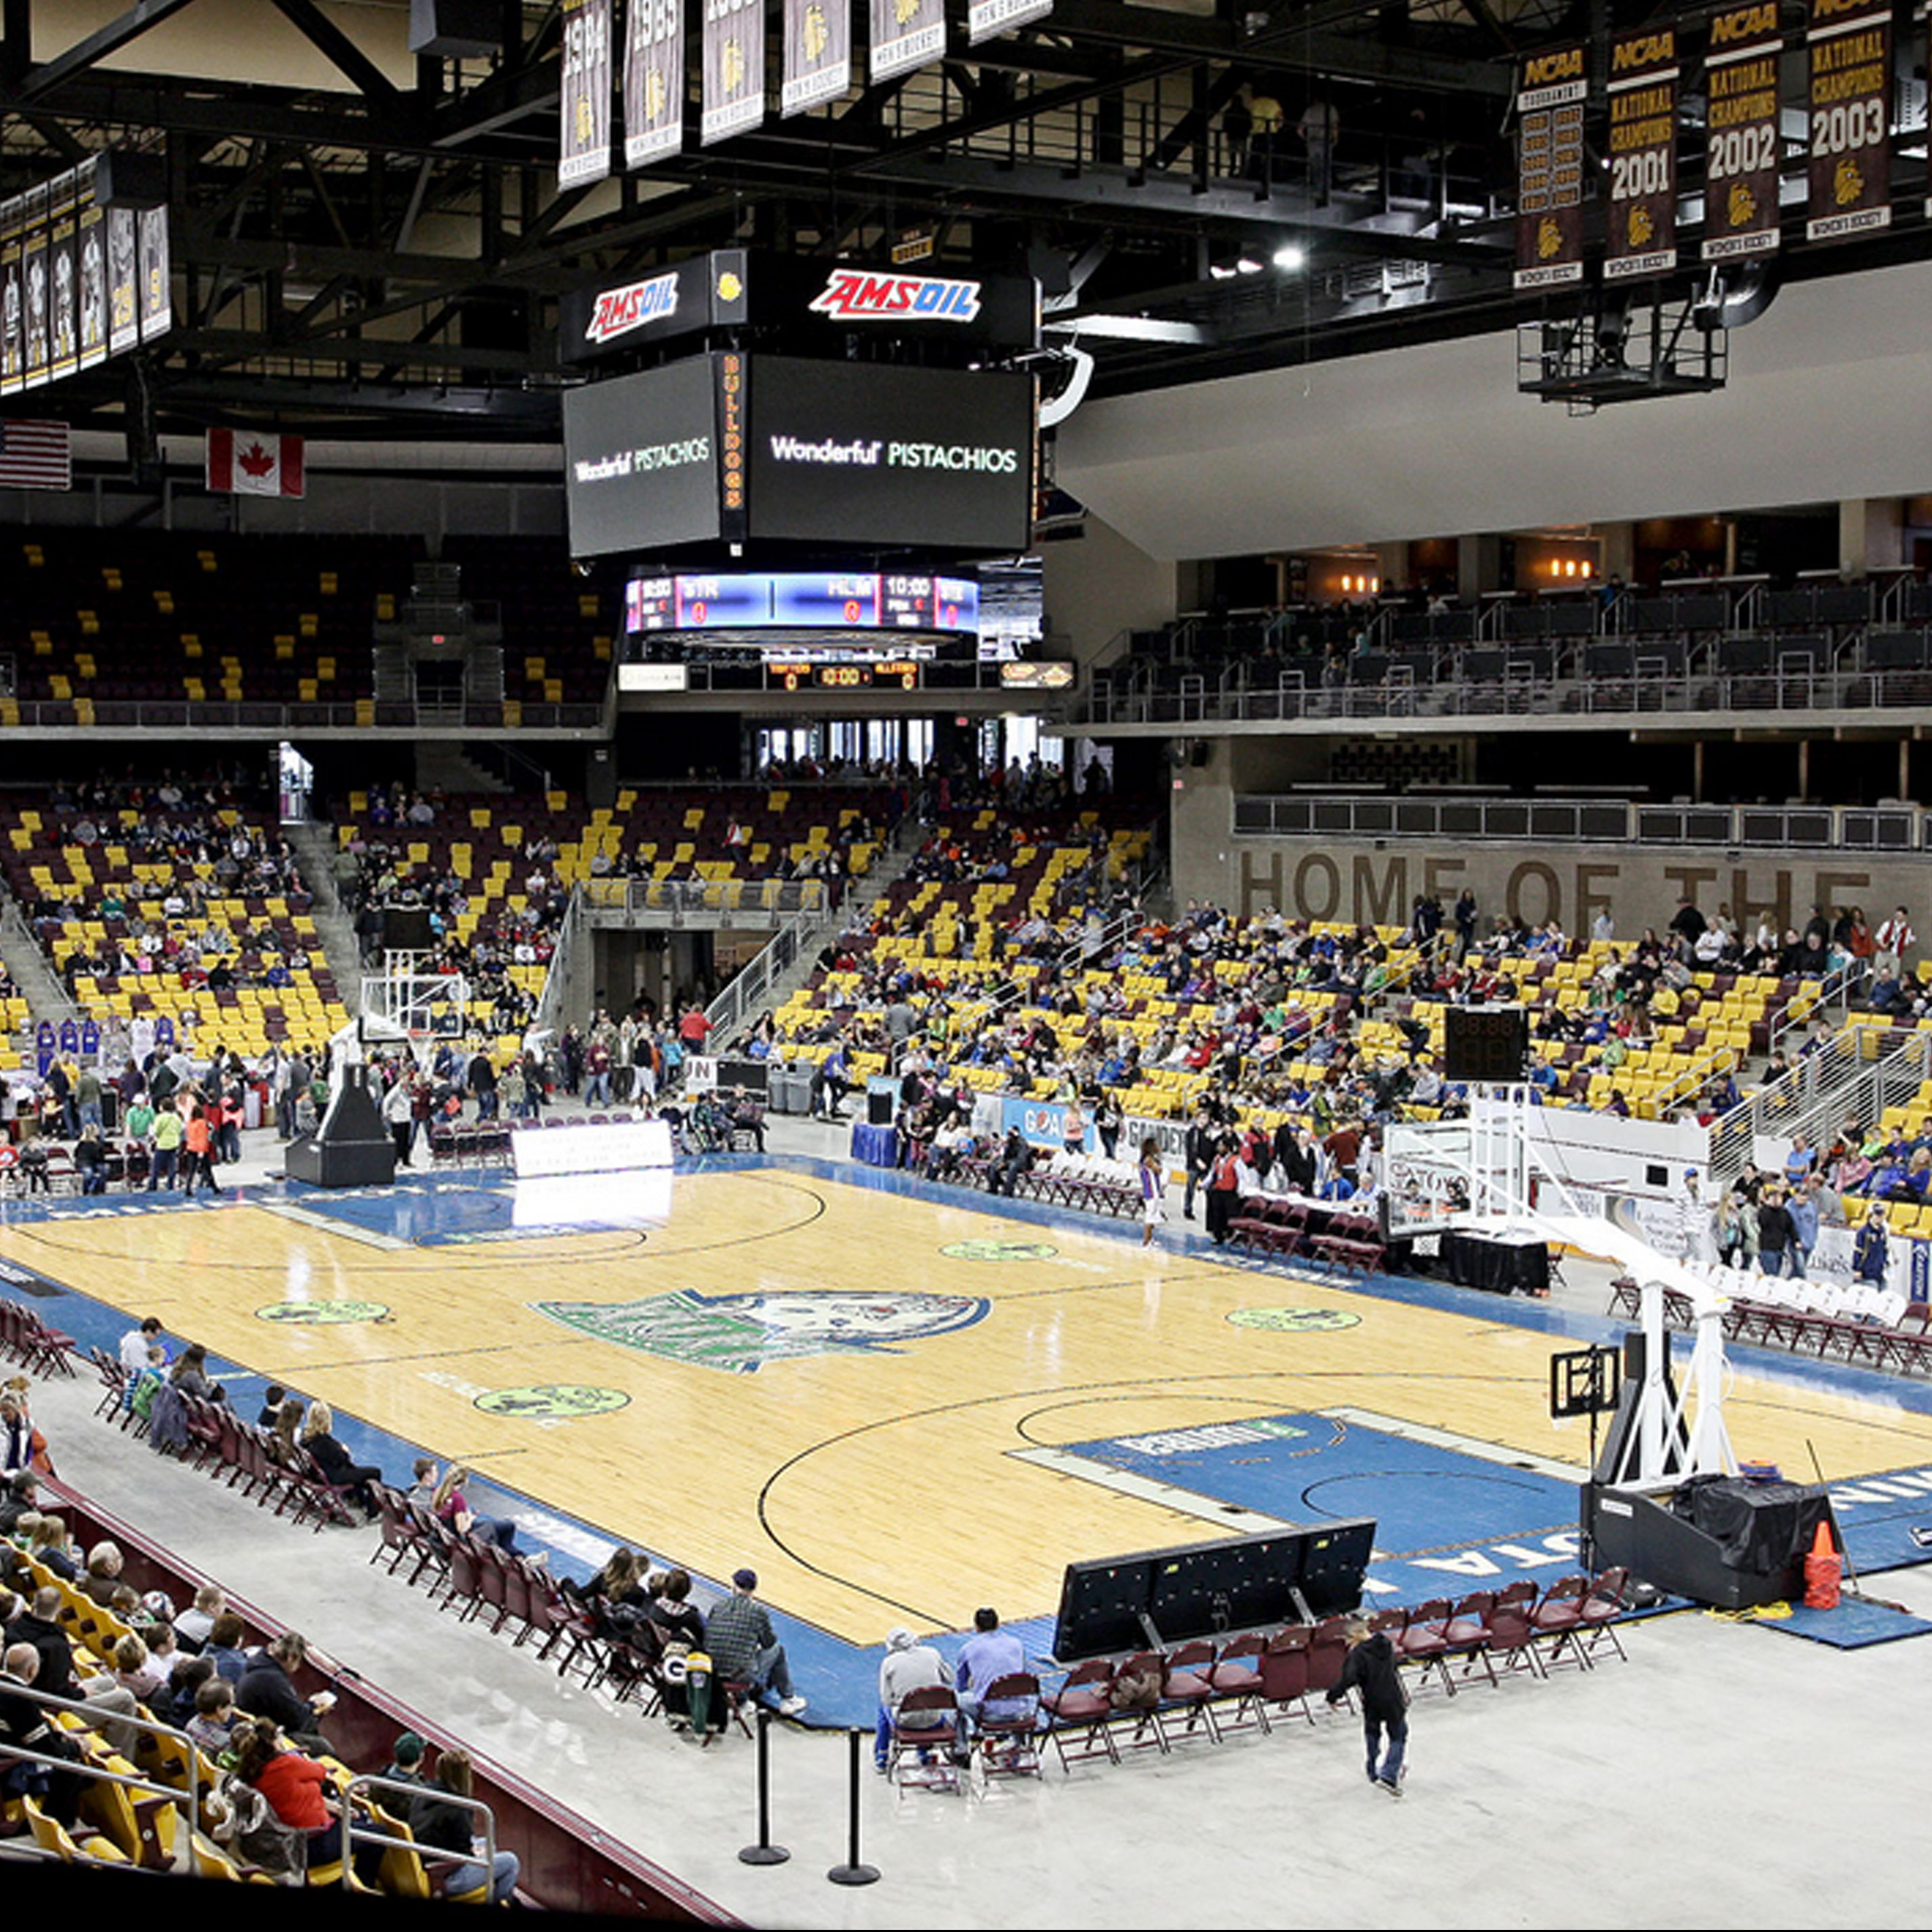 Basketball game at Amsoil Arena